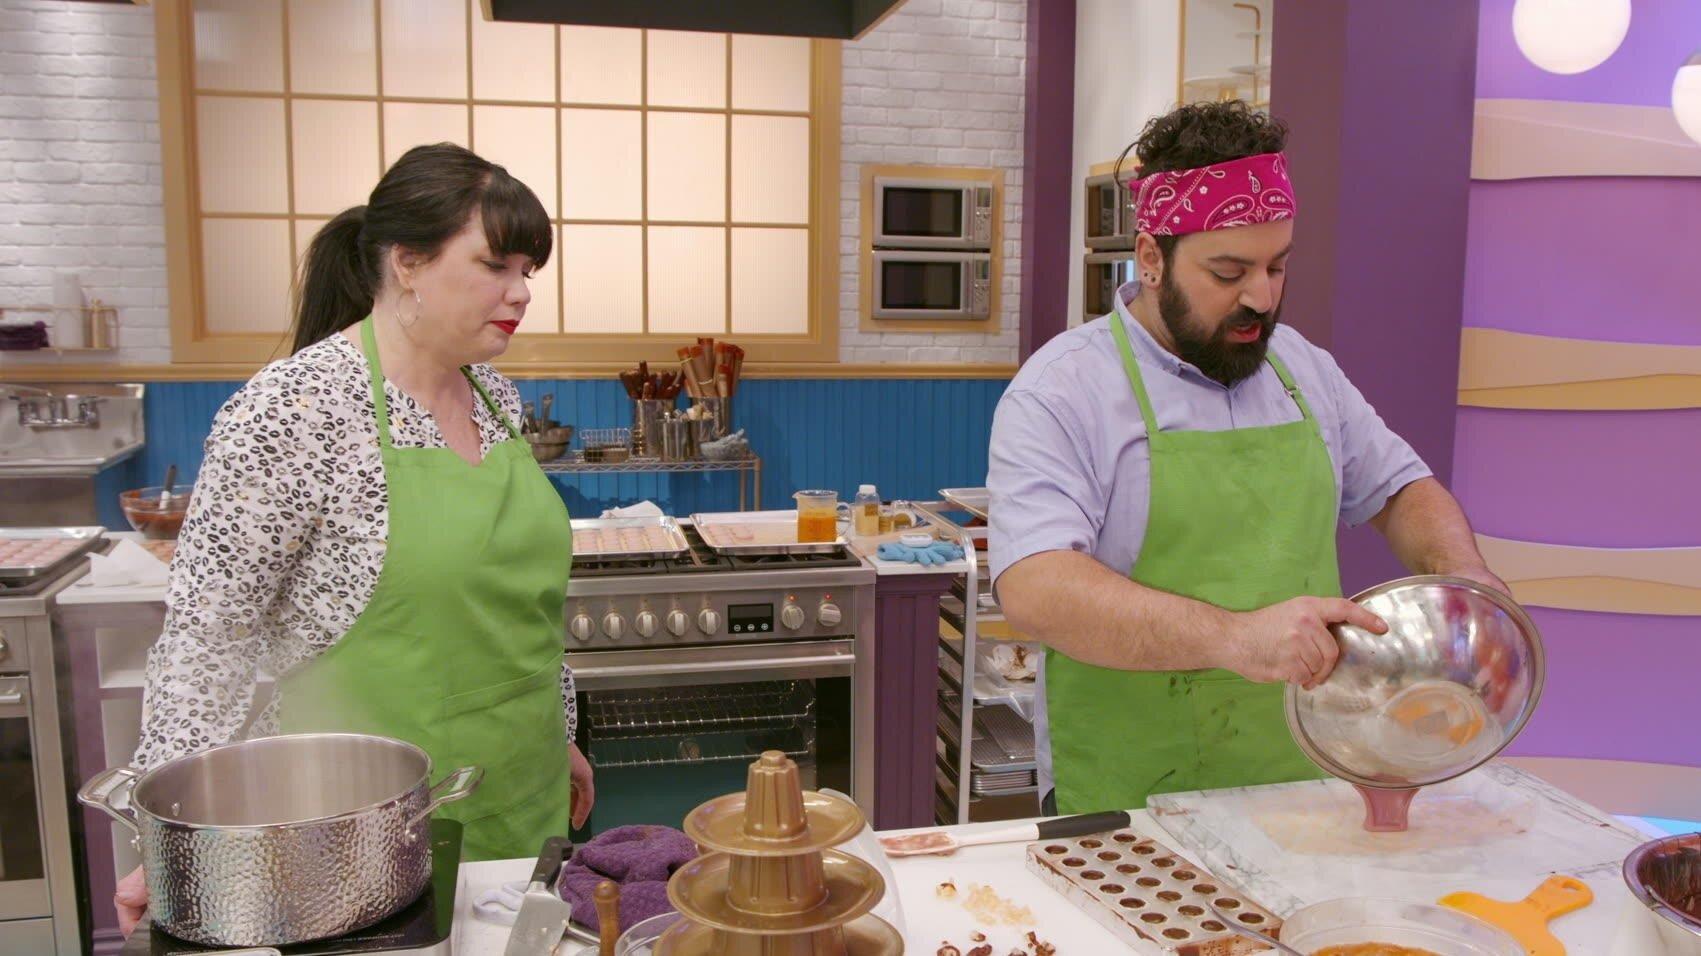 Great Chocolate Showdown — s01e08 — Good Things Come to Those Who Bake